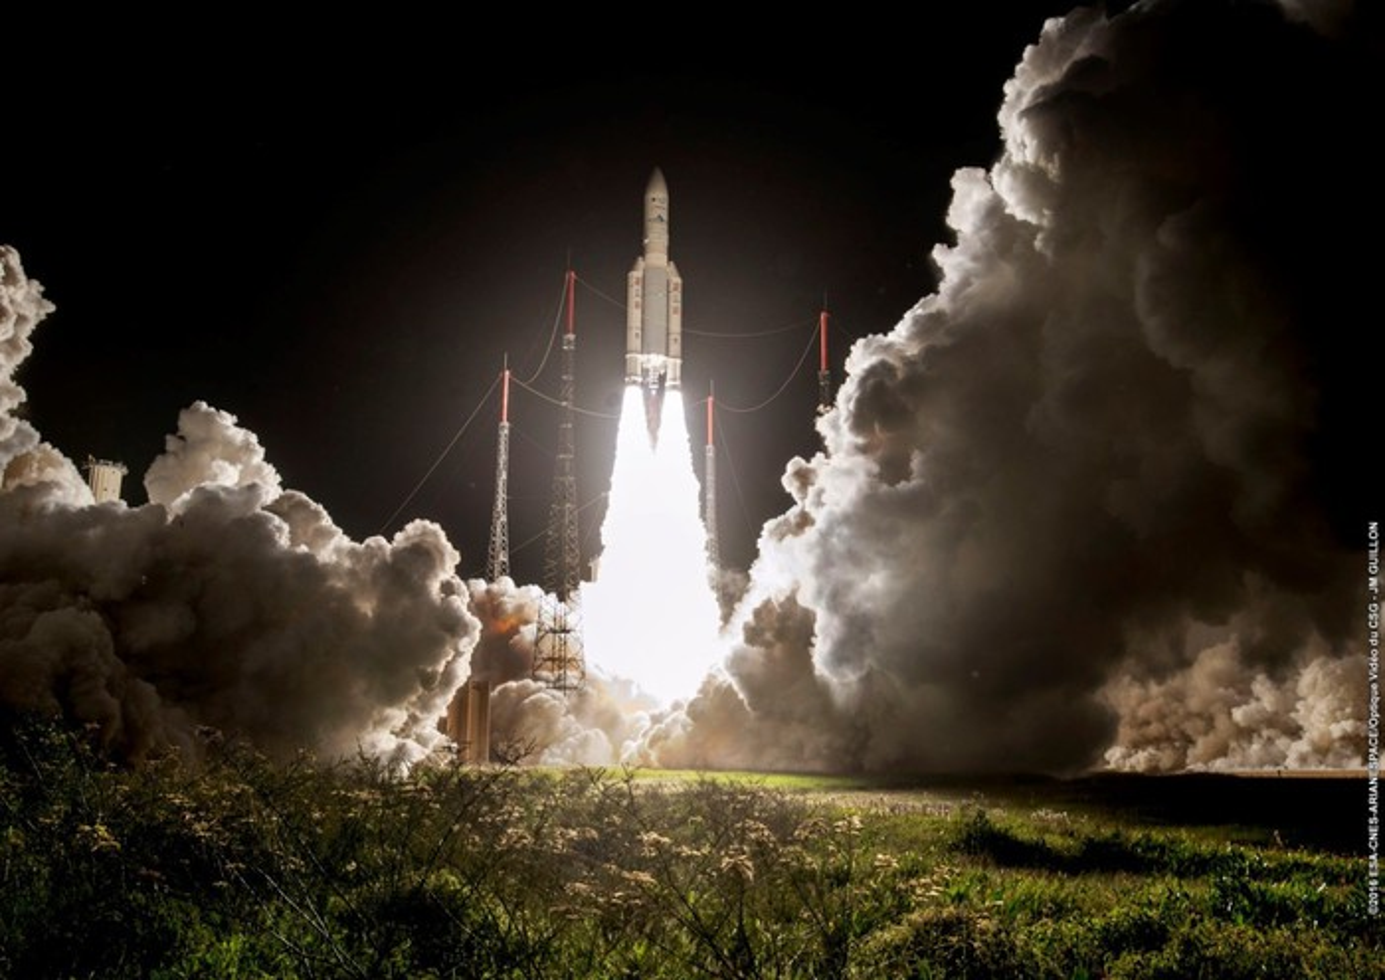 Intelsat's 29e rocket launch.